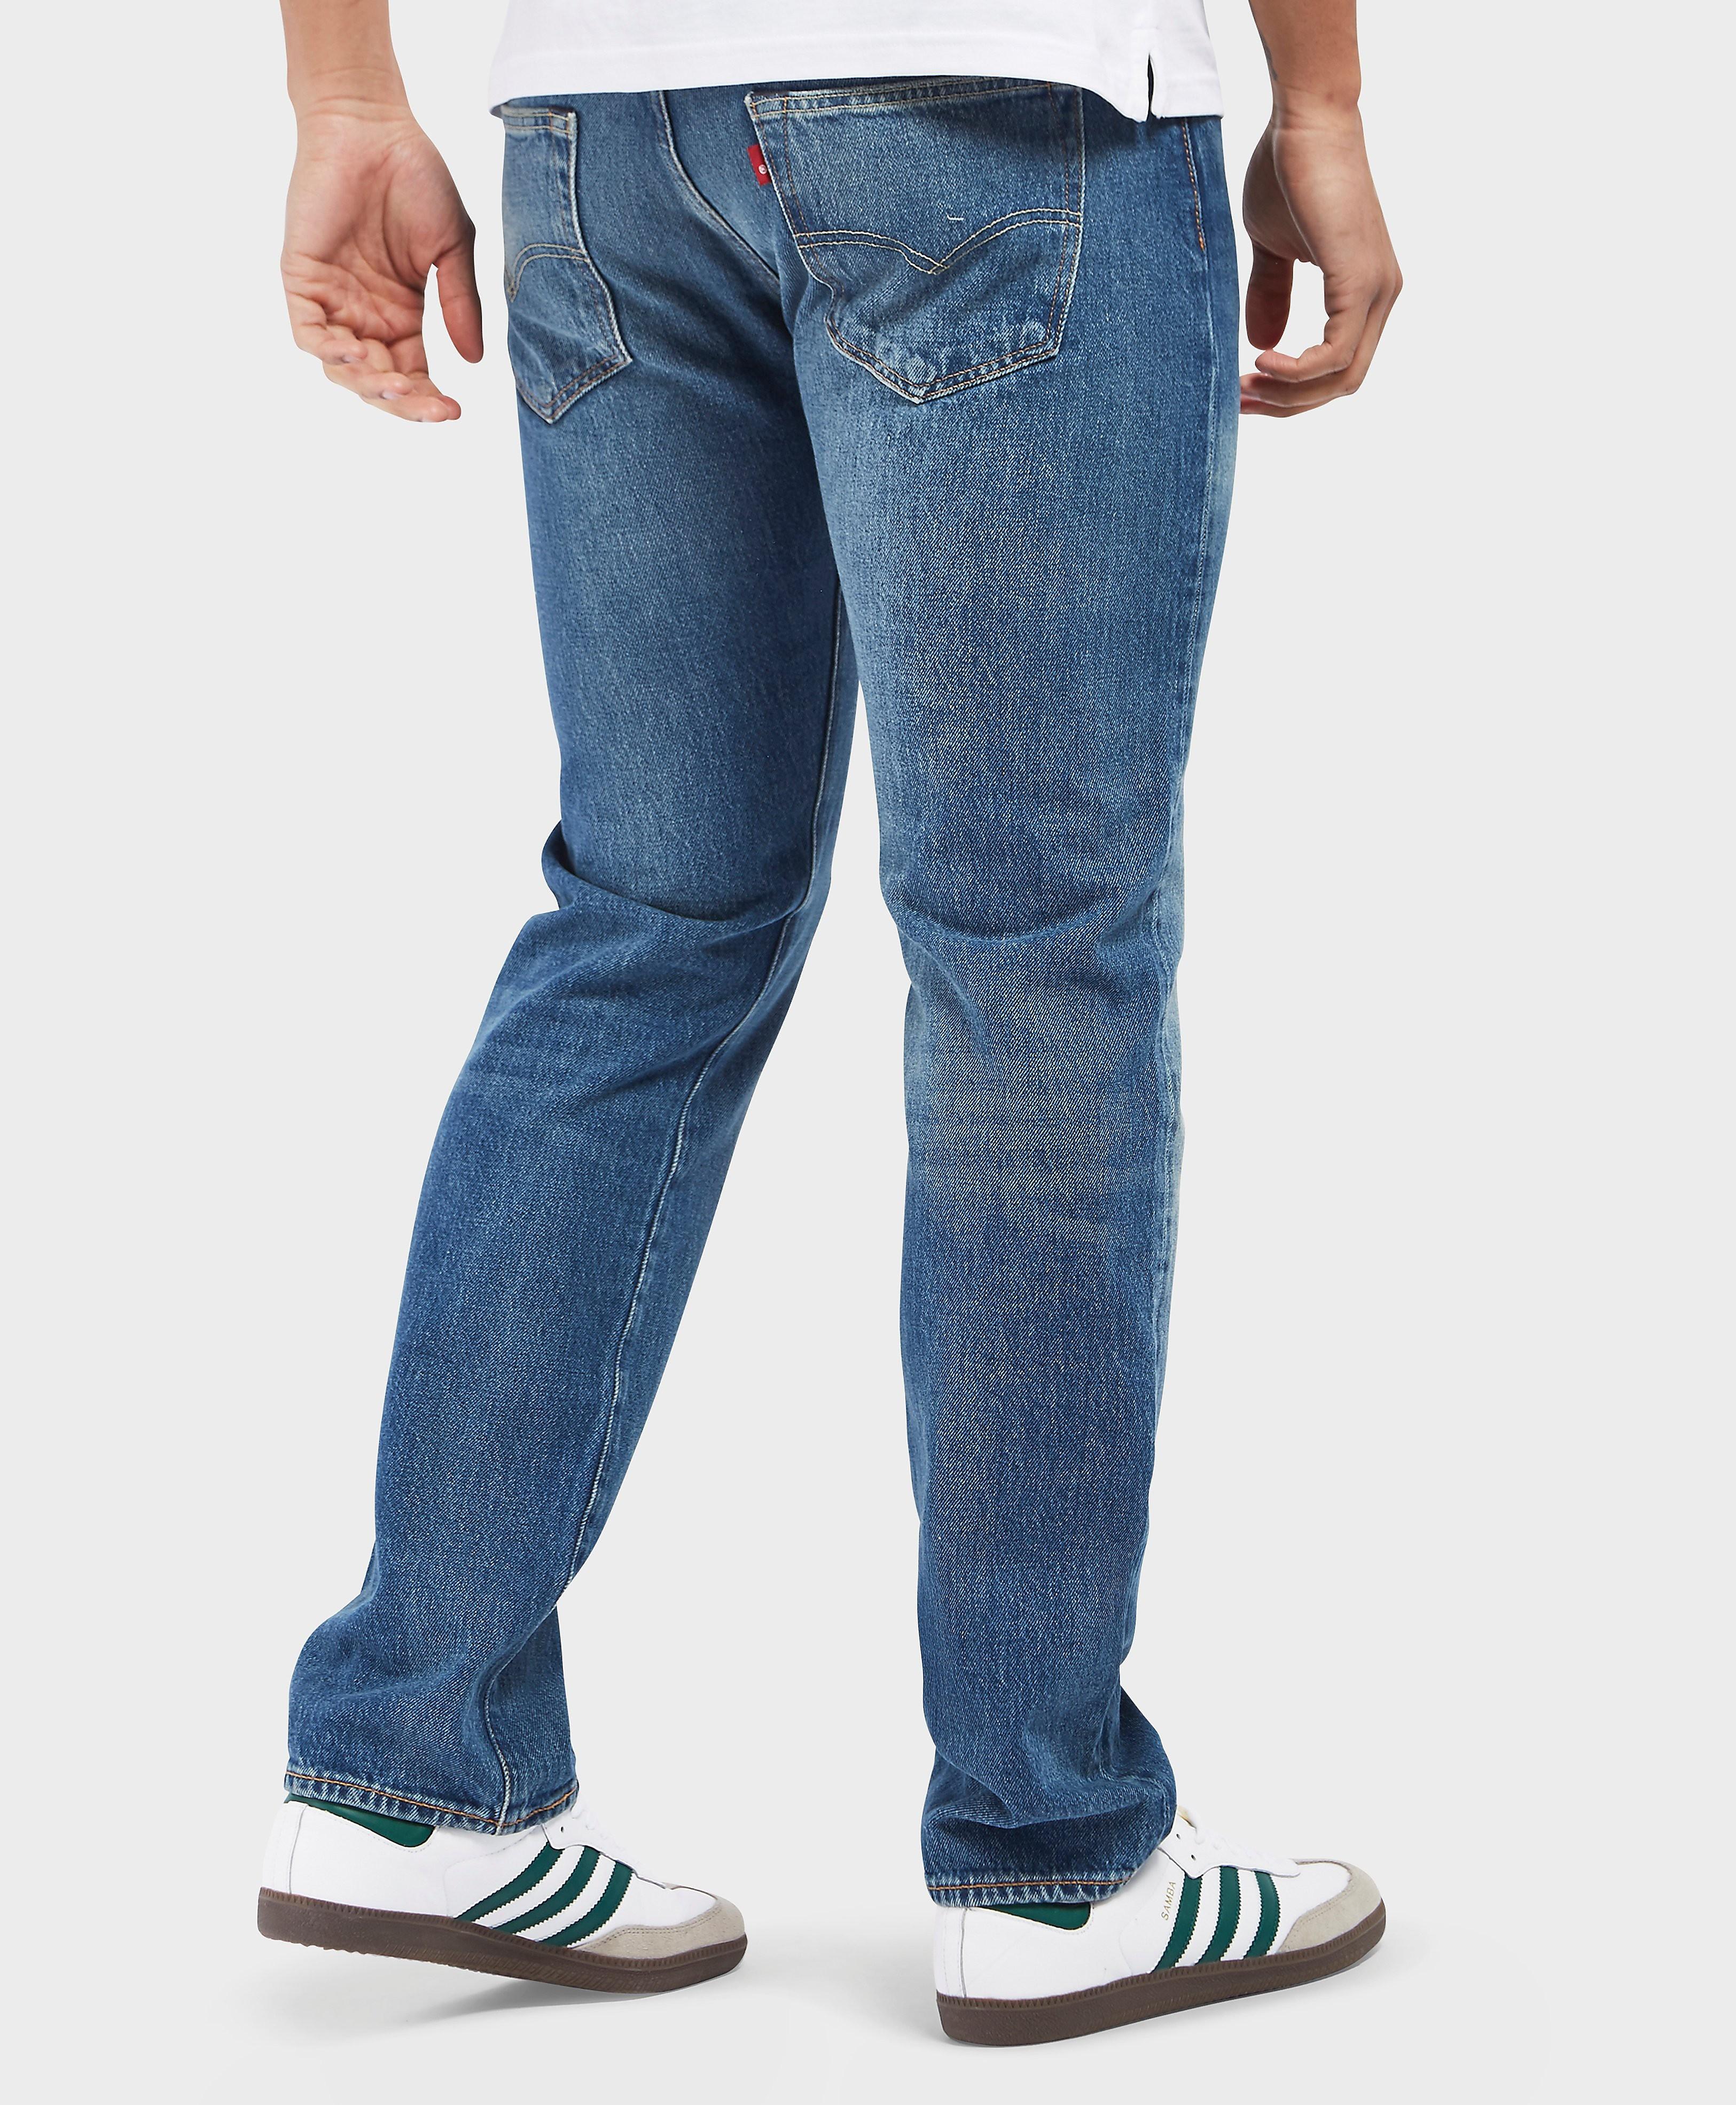 Levis 501 Original Regular Jeans